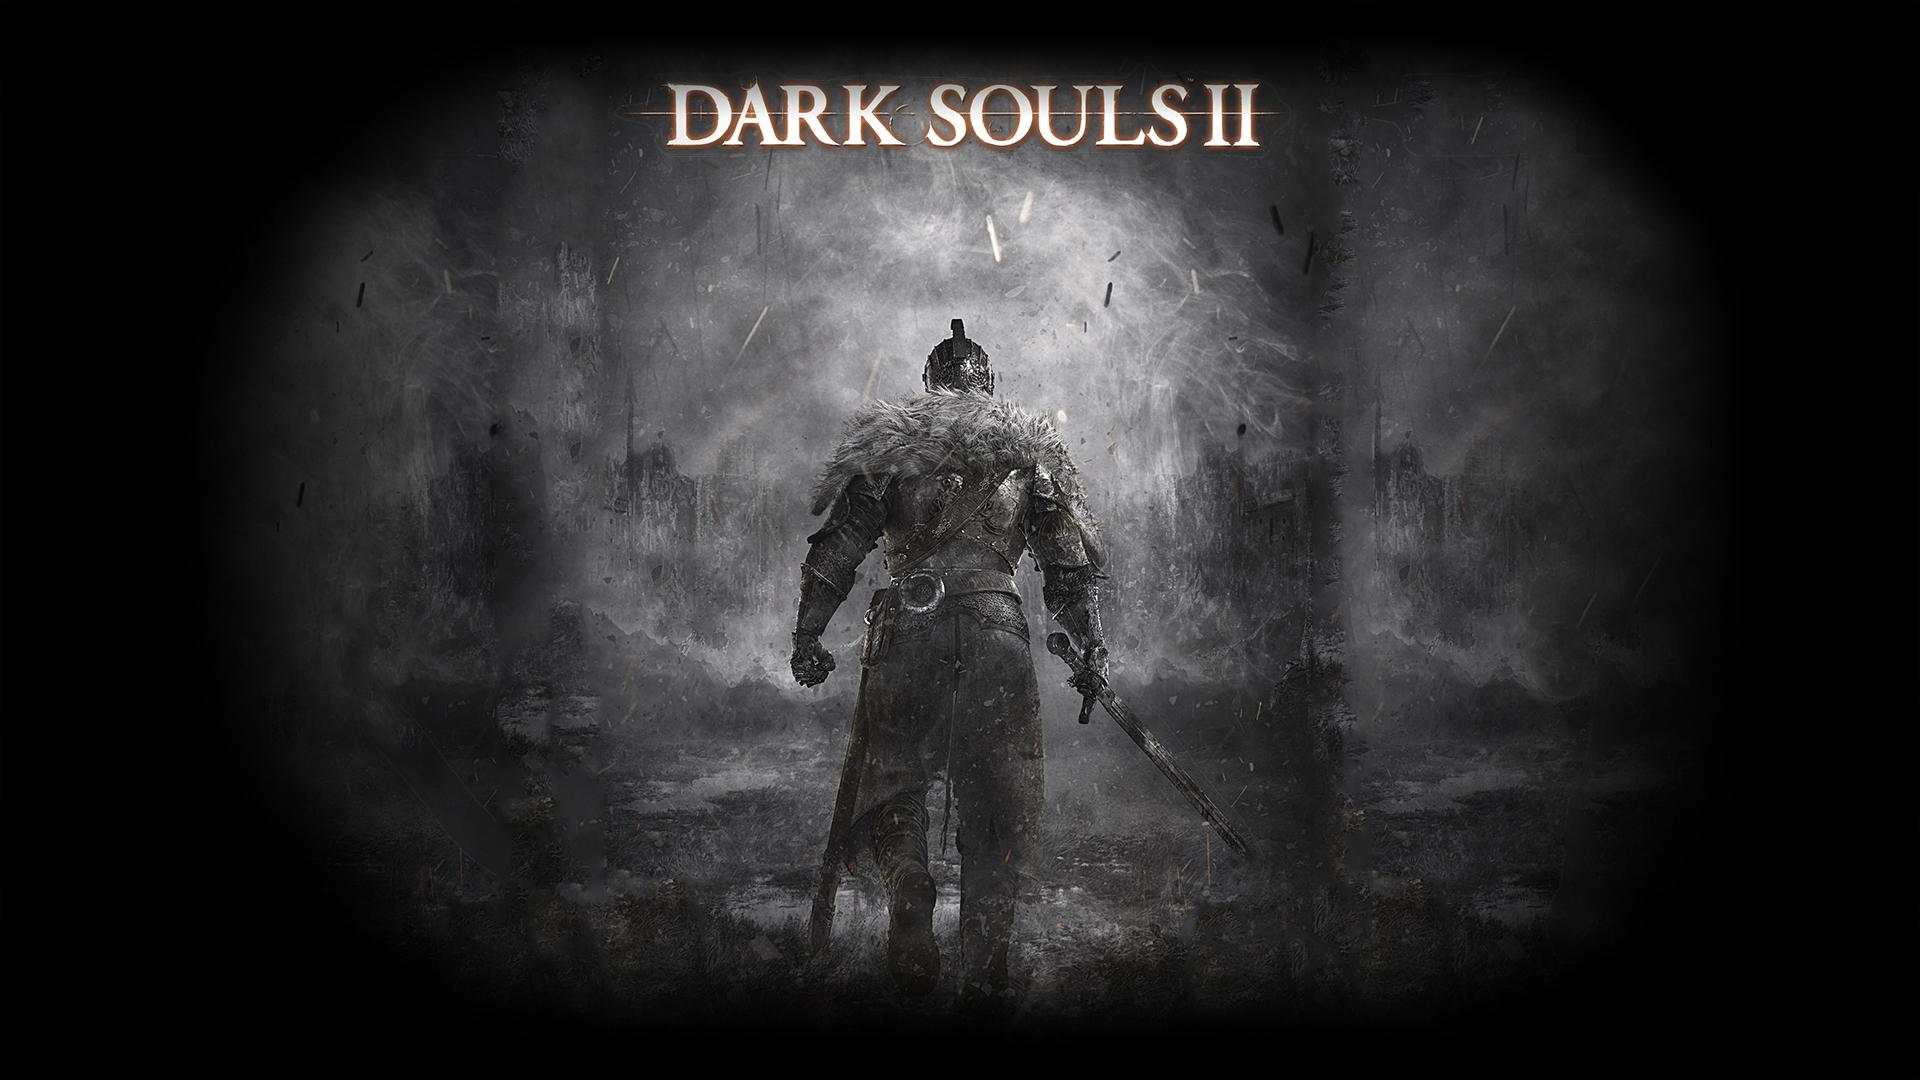 Dark Souls 2 Wallpaper Hd: Dark Souls IPad Wallpaper